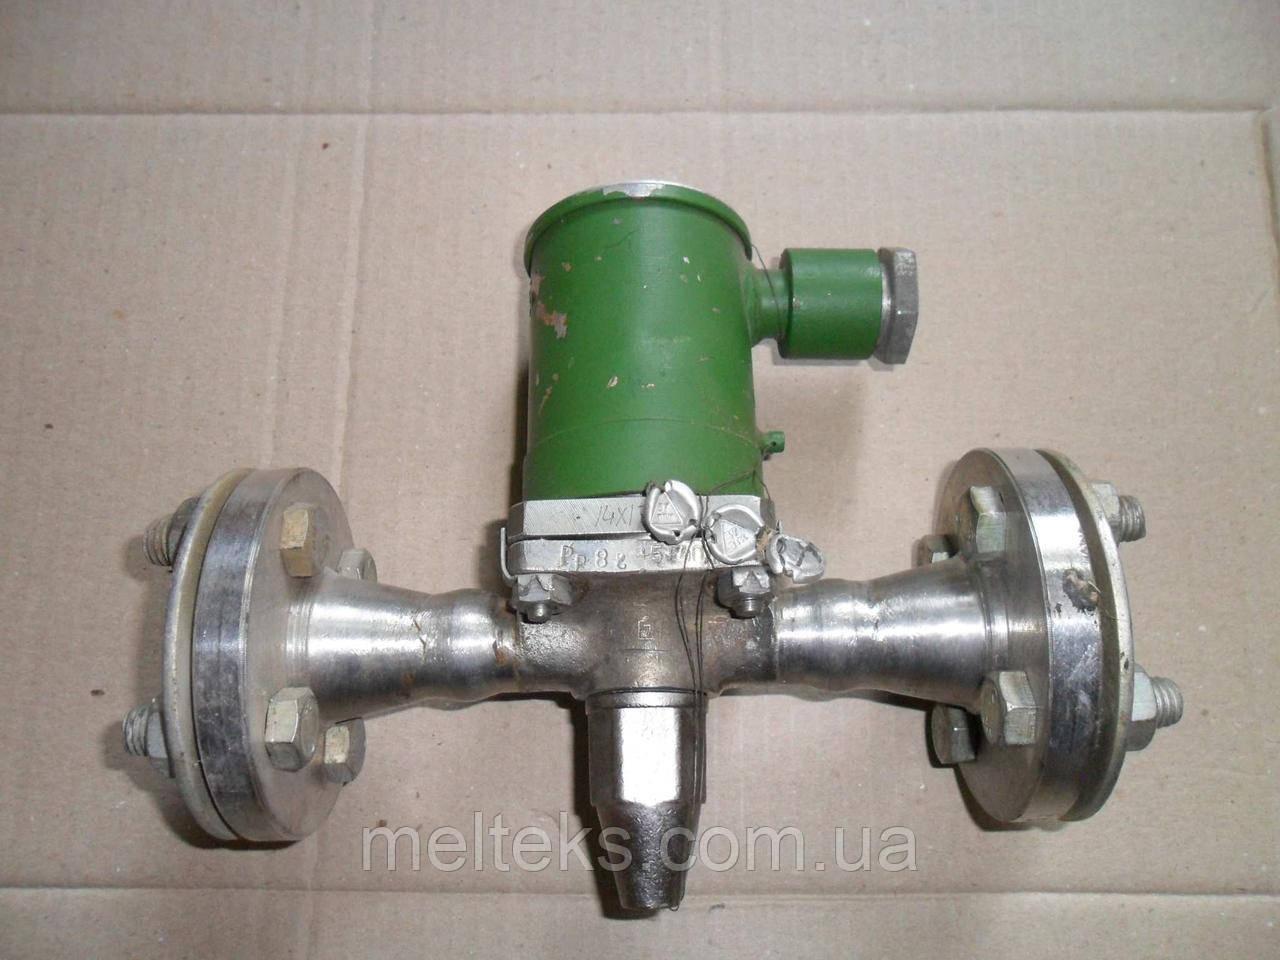 Вентиль клапан Т26346 015